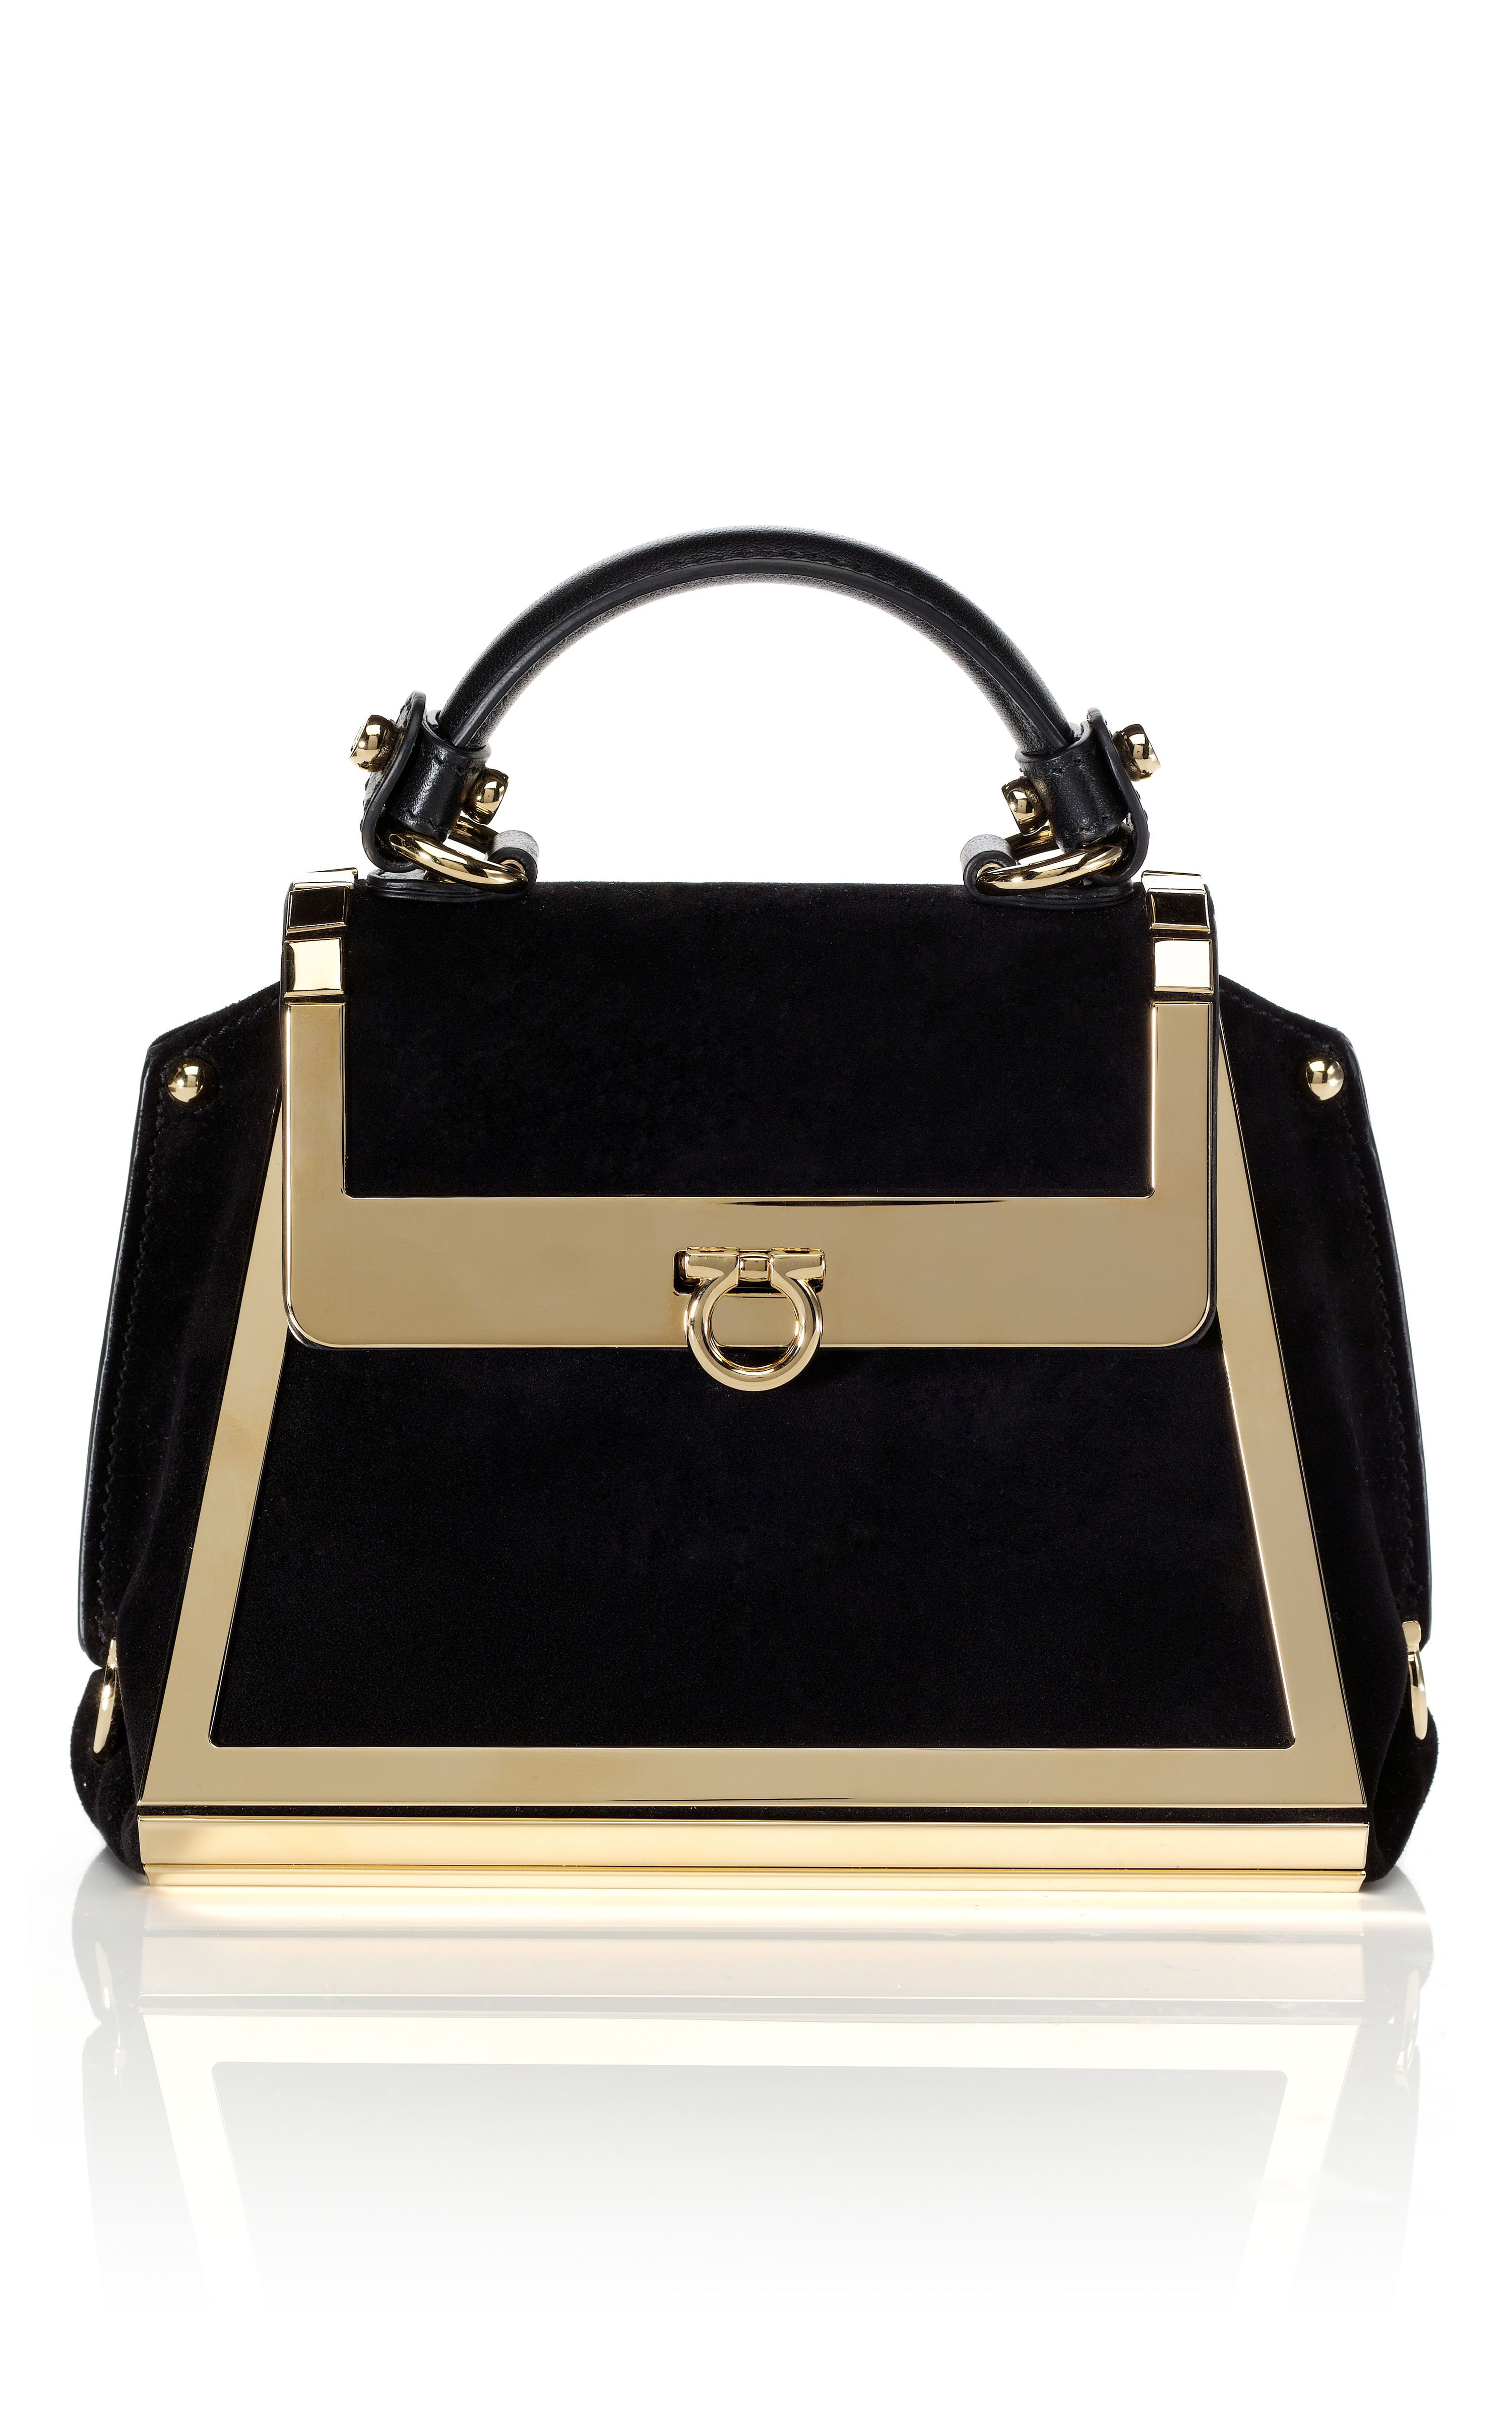 681273fd6fa80 Shop Salvatore Ferragamo Sofia Evening Bag - Ready-to-Wear Trunkshow at  Moda Operandi